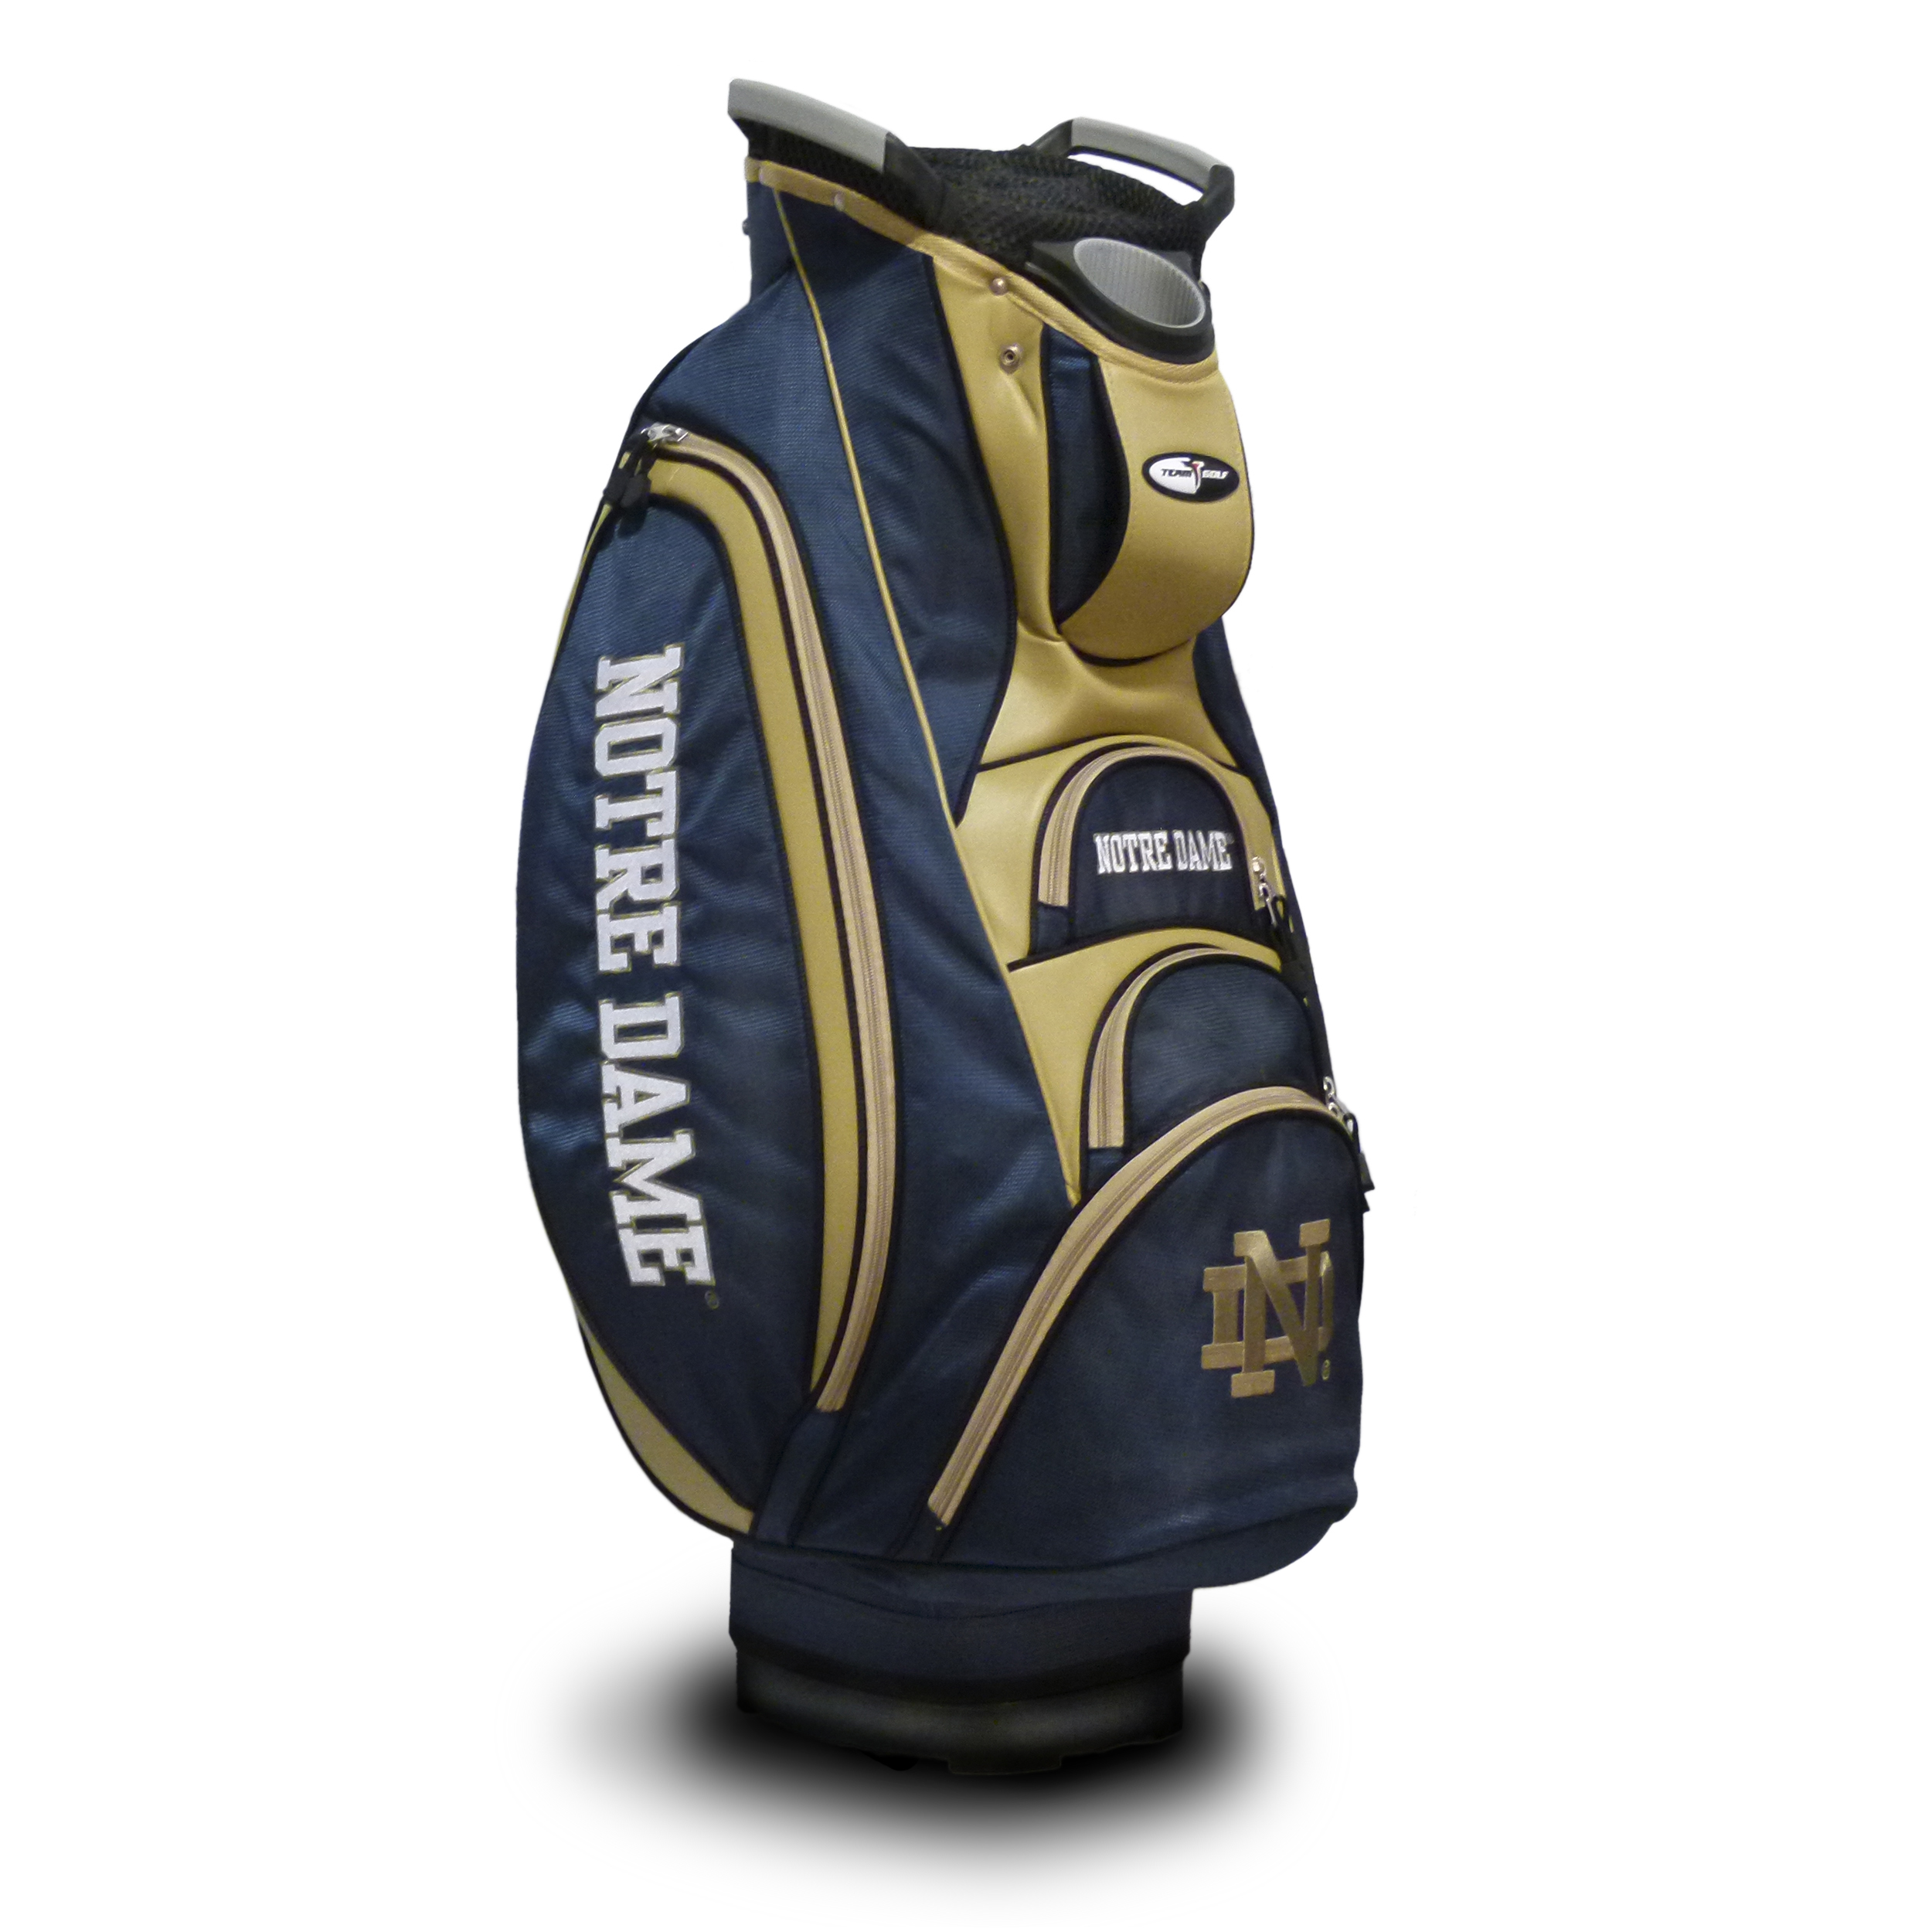 Notre Dame Fighting Irish Golf Cart Bag